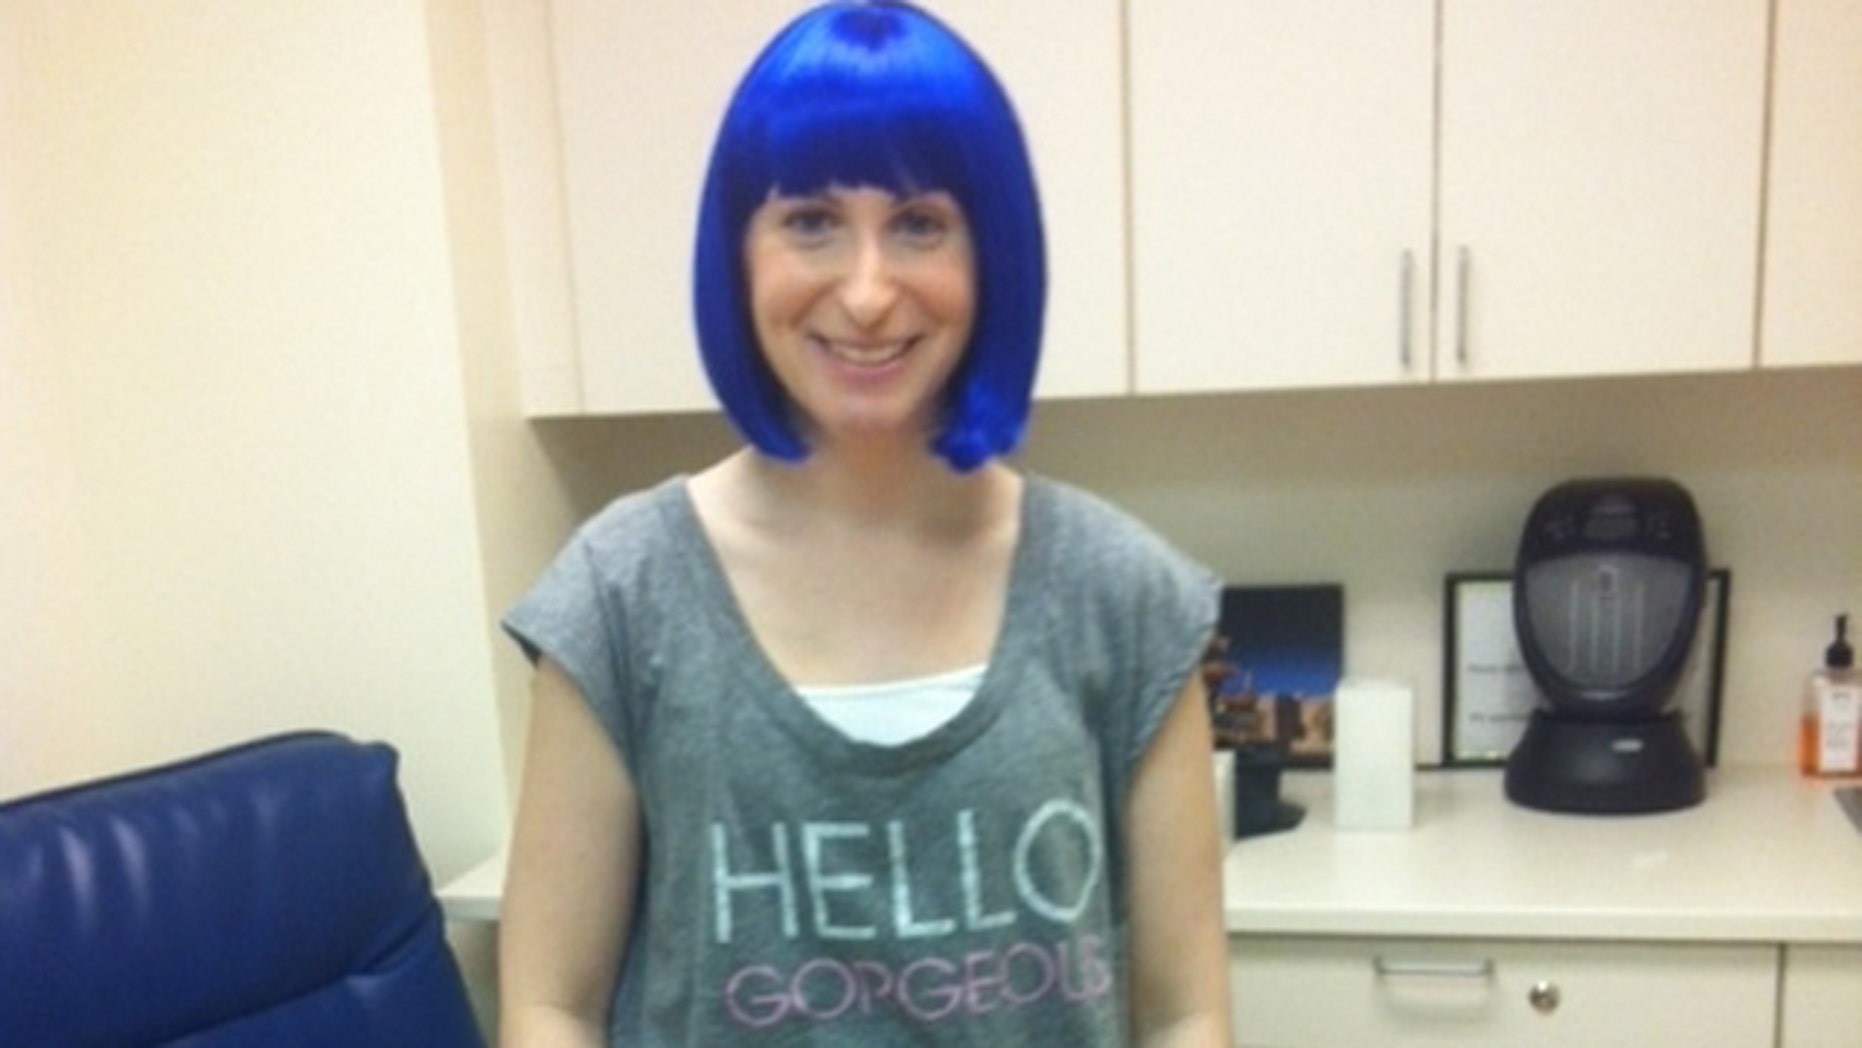 Annie Goodman during a chemotherapy treatment. (Courtesy Annie Goodman)